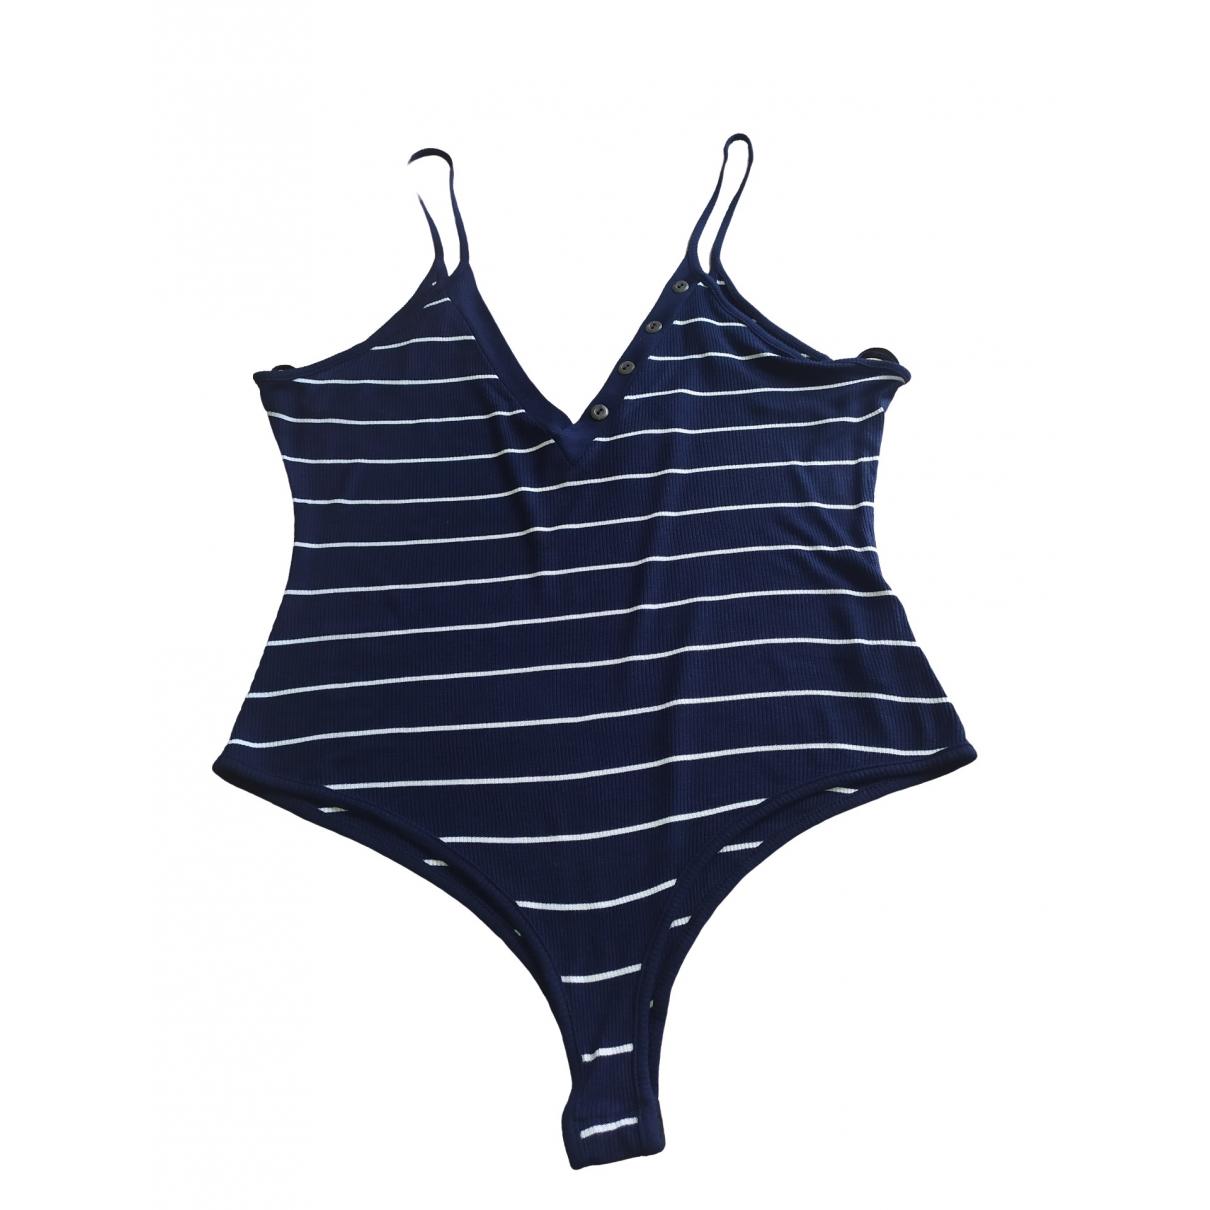 Windsor - Top   pour femme - bleu